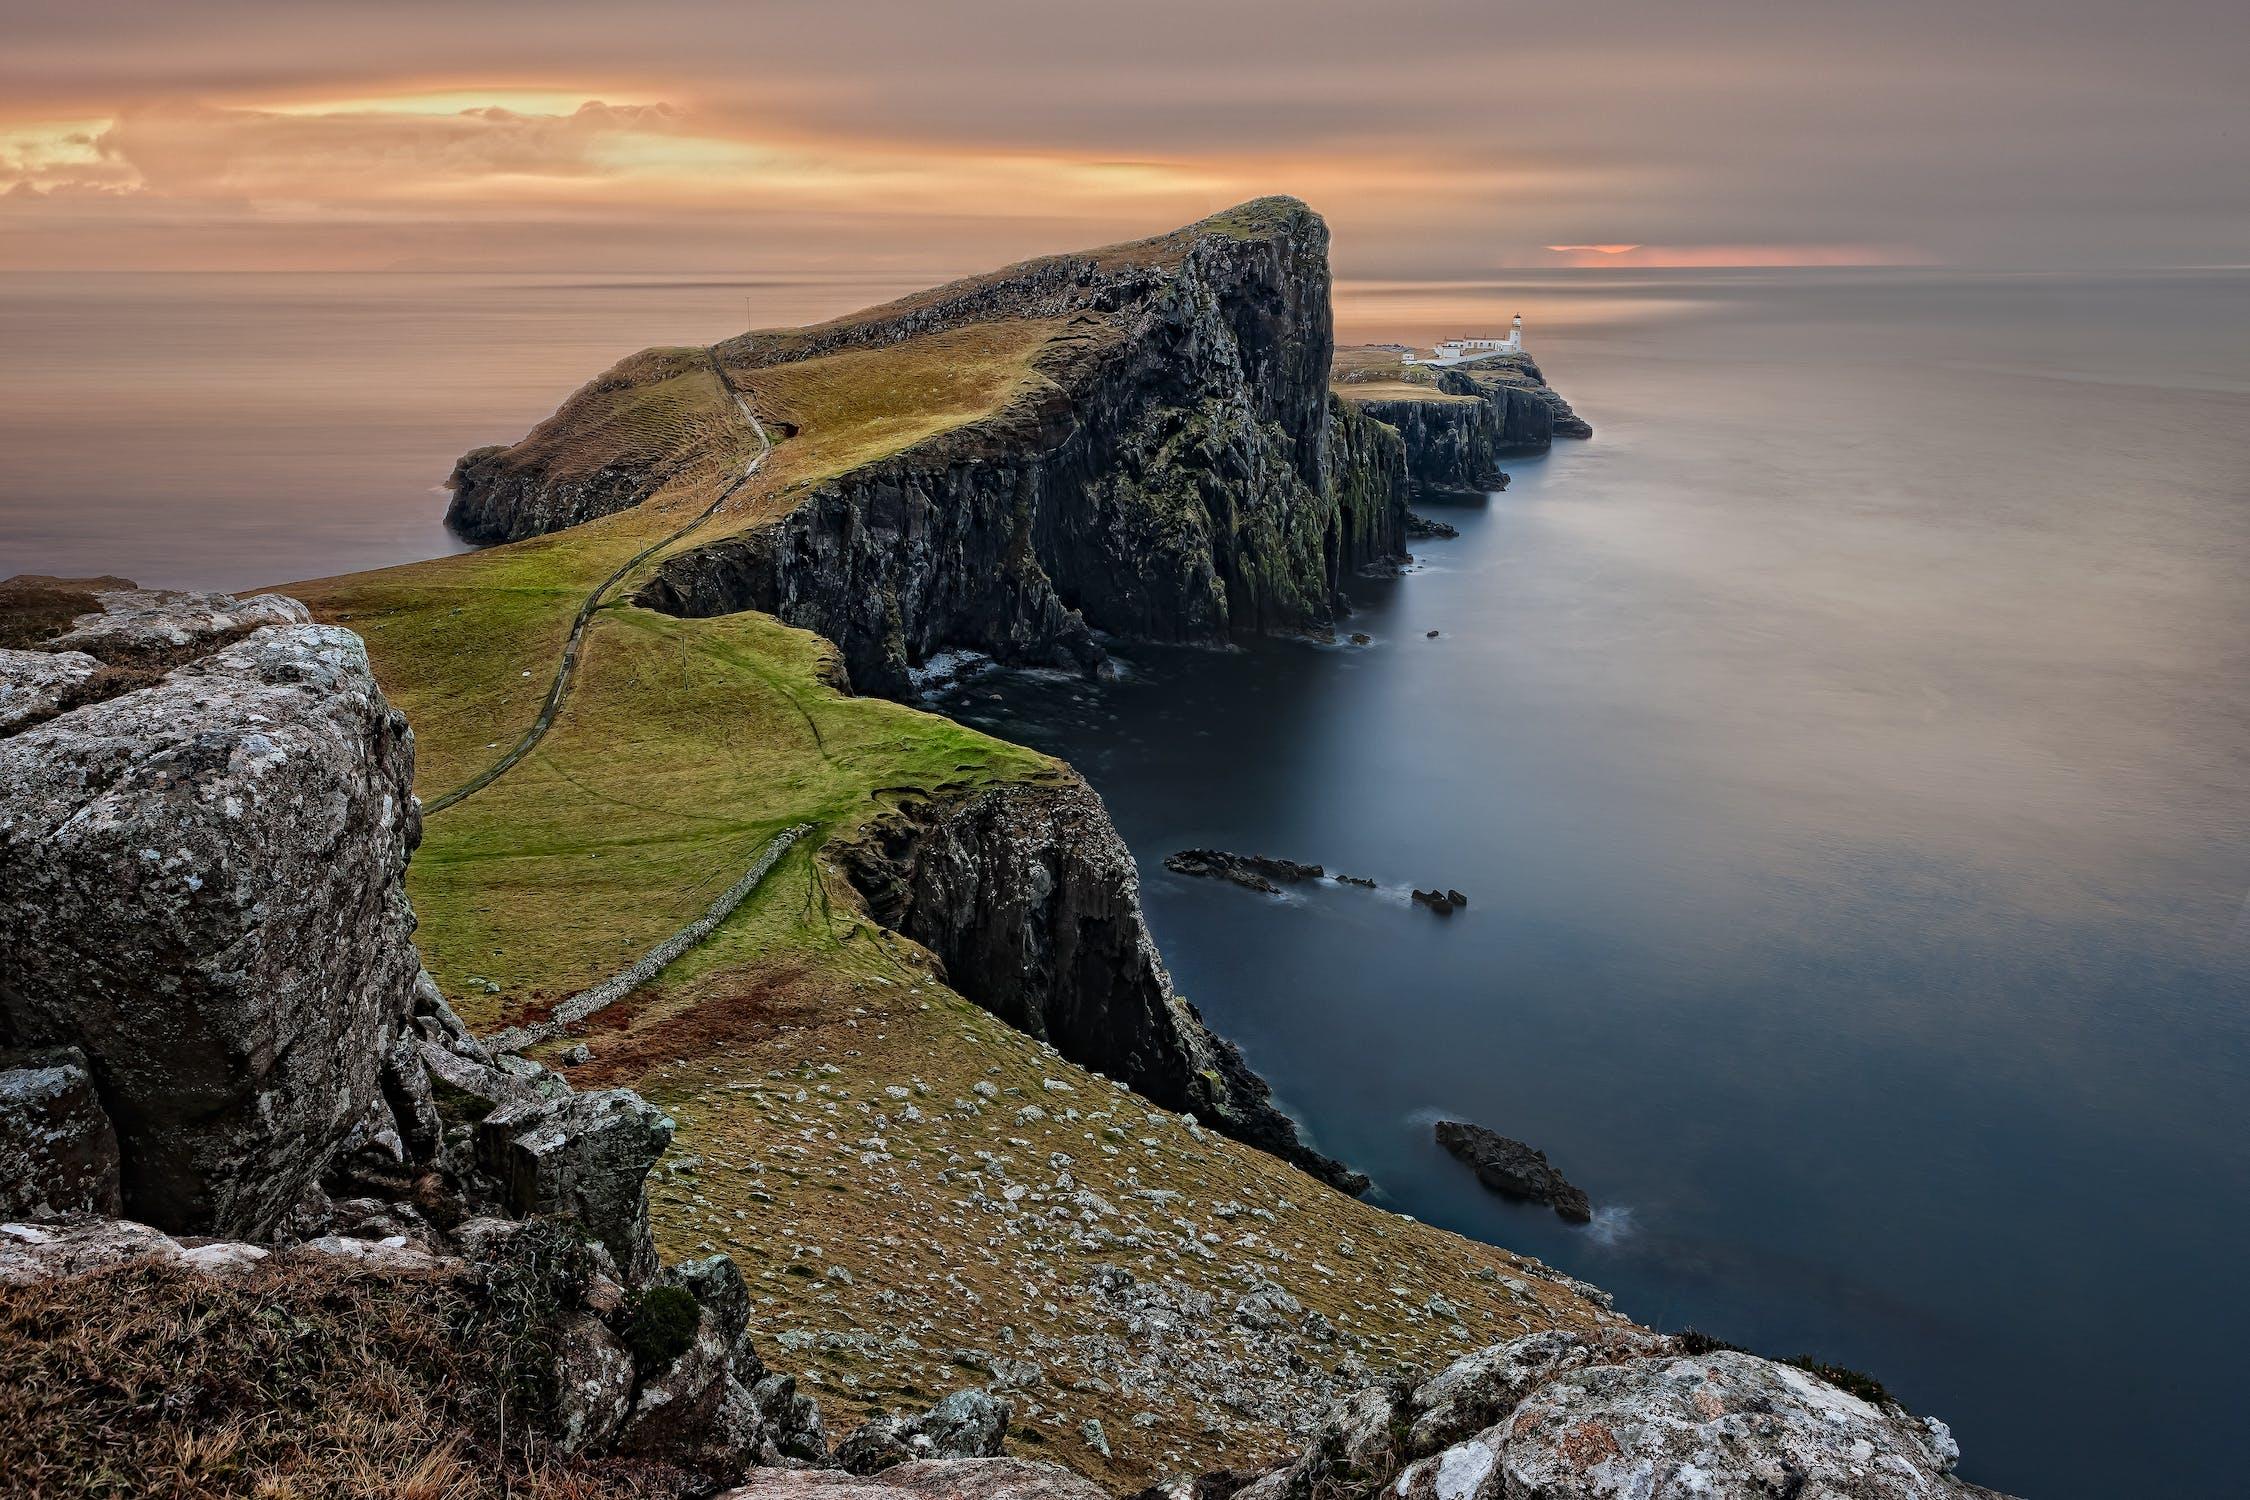 A picturesque Scottish coastline. One way to enjoy a Scottish Staycation.